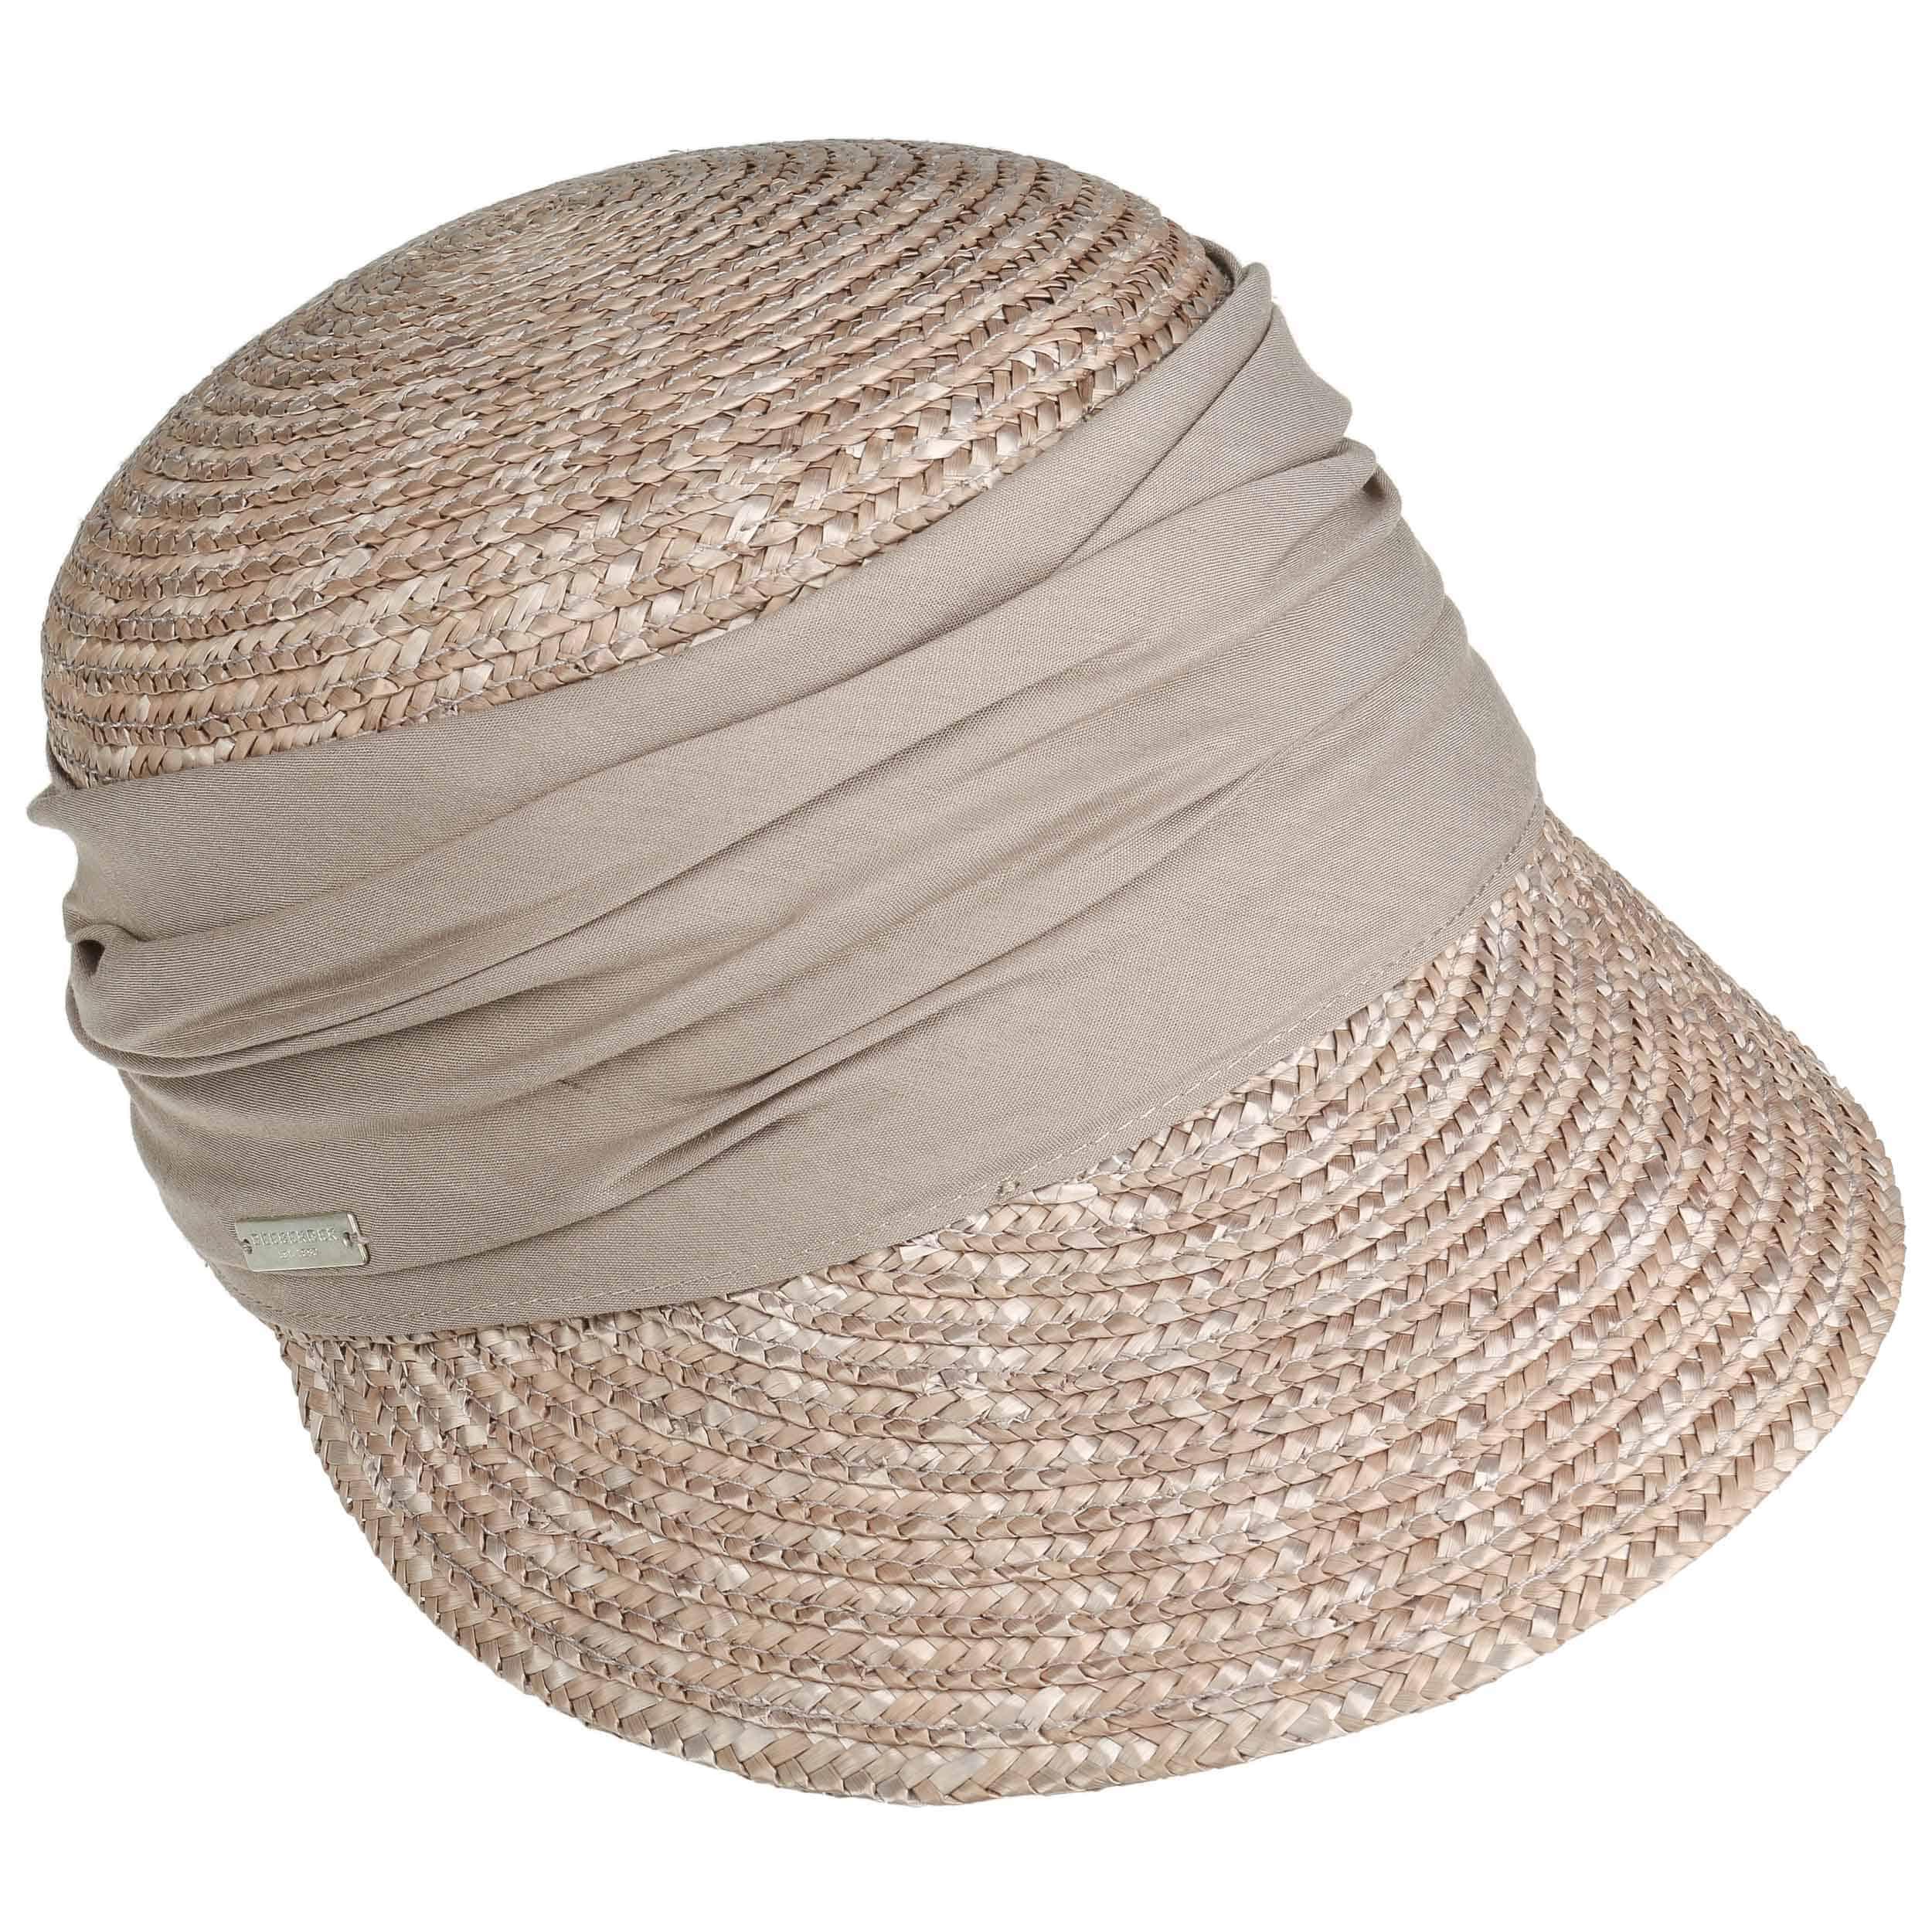 Seeberger Grace Straw Cap Women Caps Visors womens cap straw